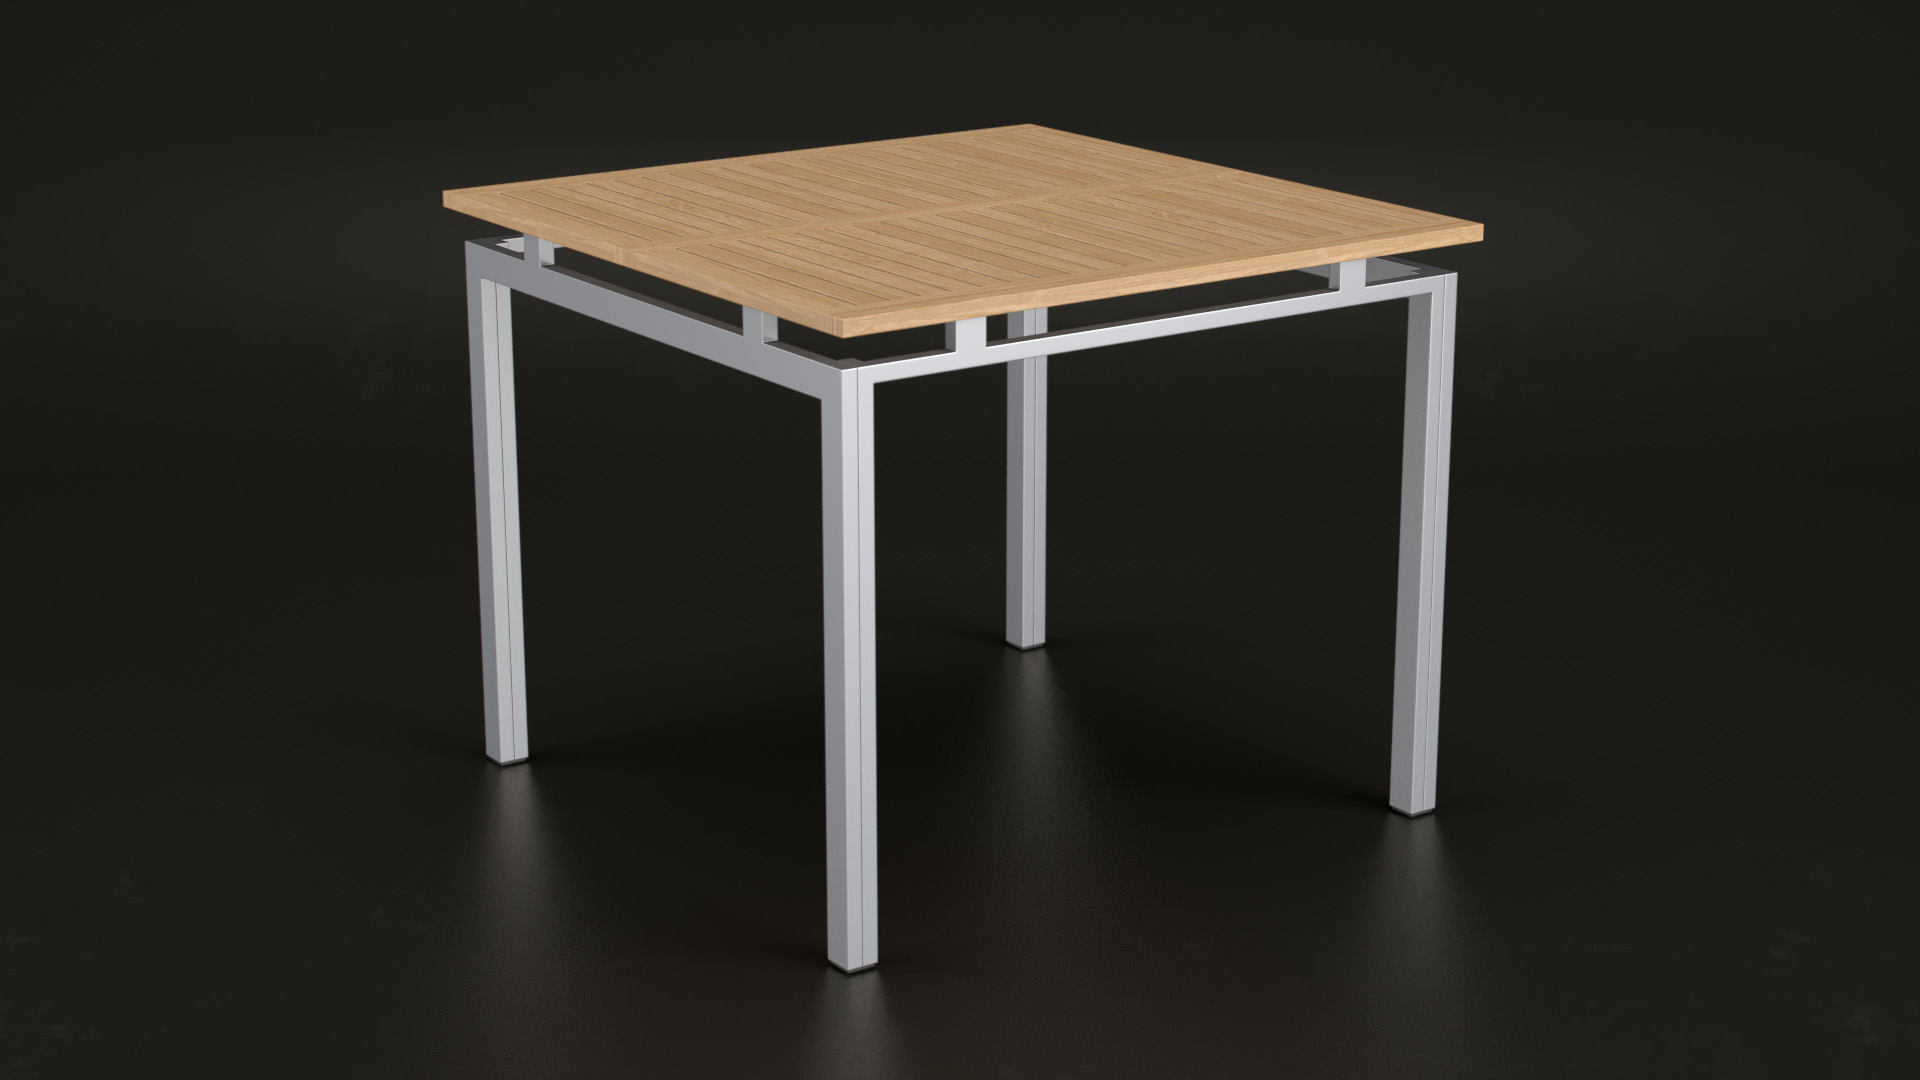 Alu_WoodGarden_Table_BlackSet_01_V1.01_0000